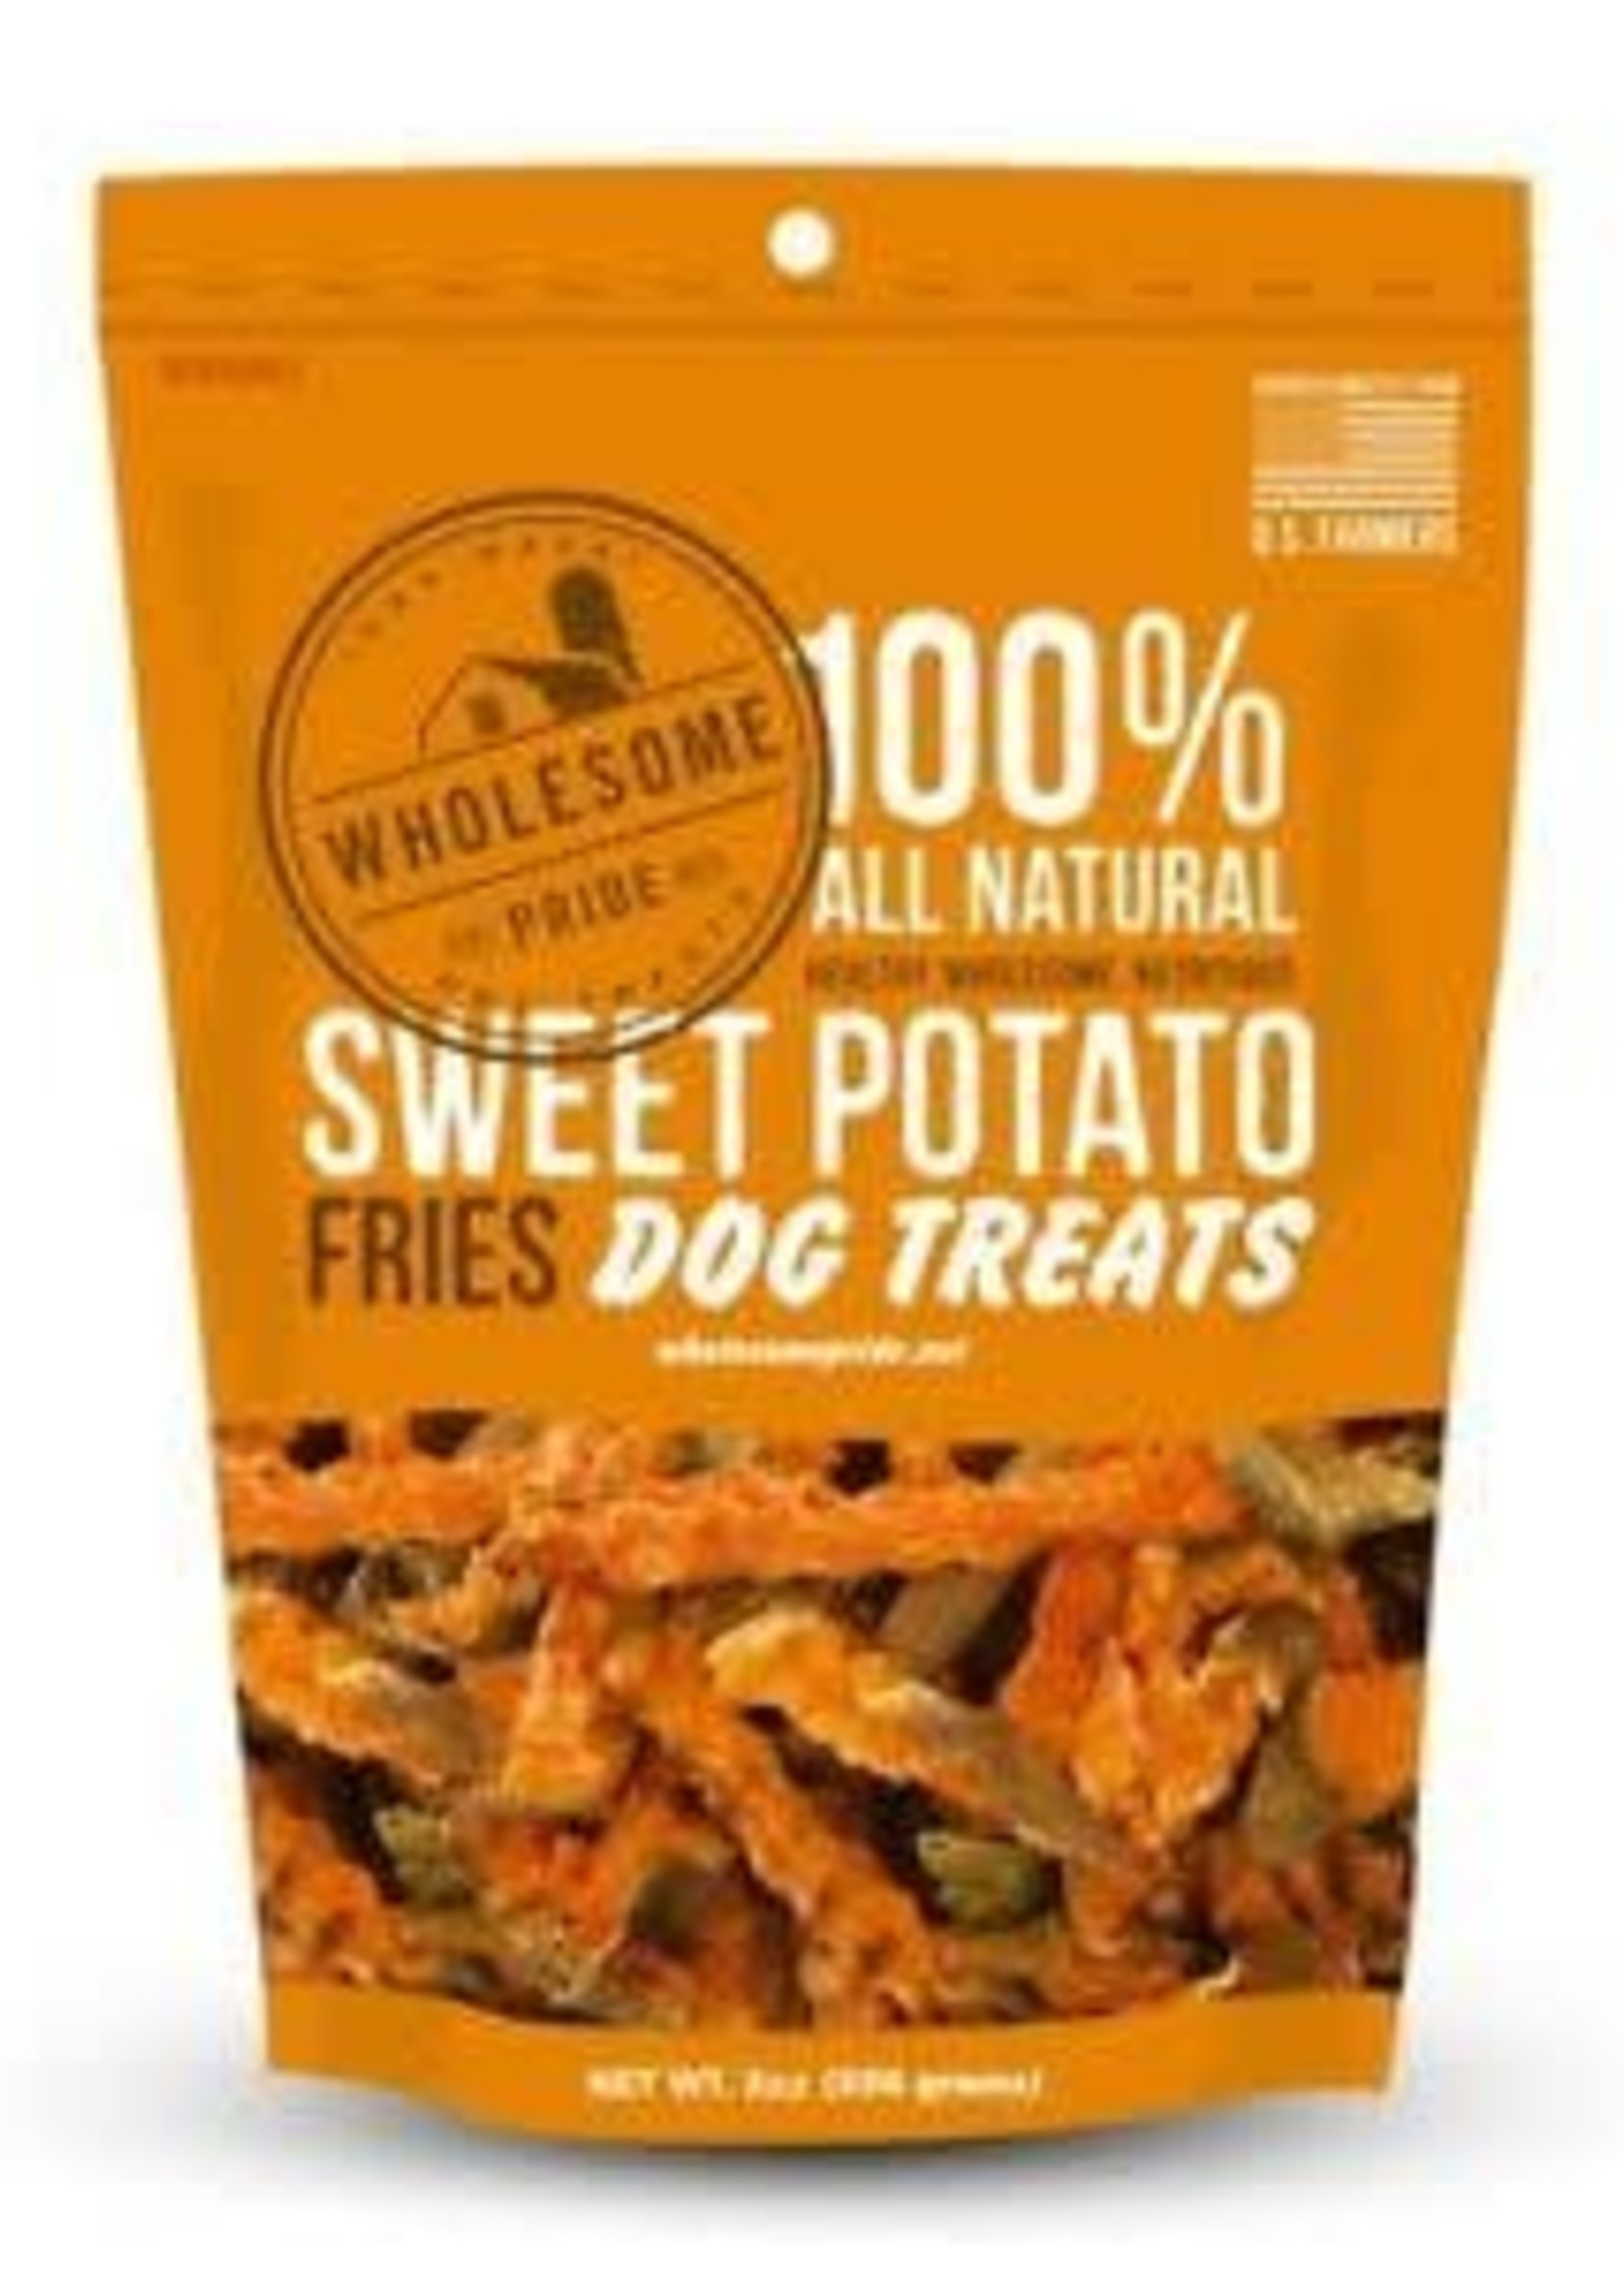 Wholesome Pride Pet Wholesome Sweet Potato French Fries Dog Treats 8 oz